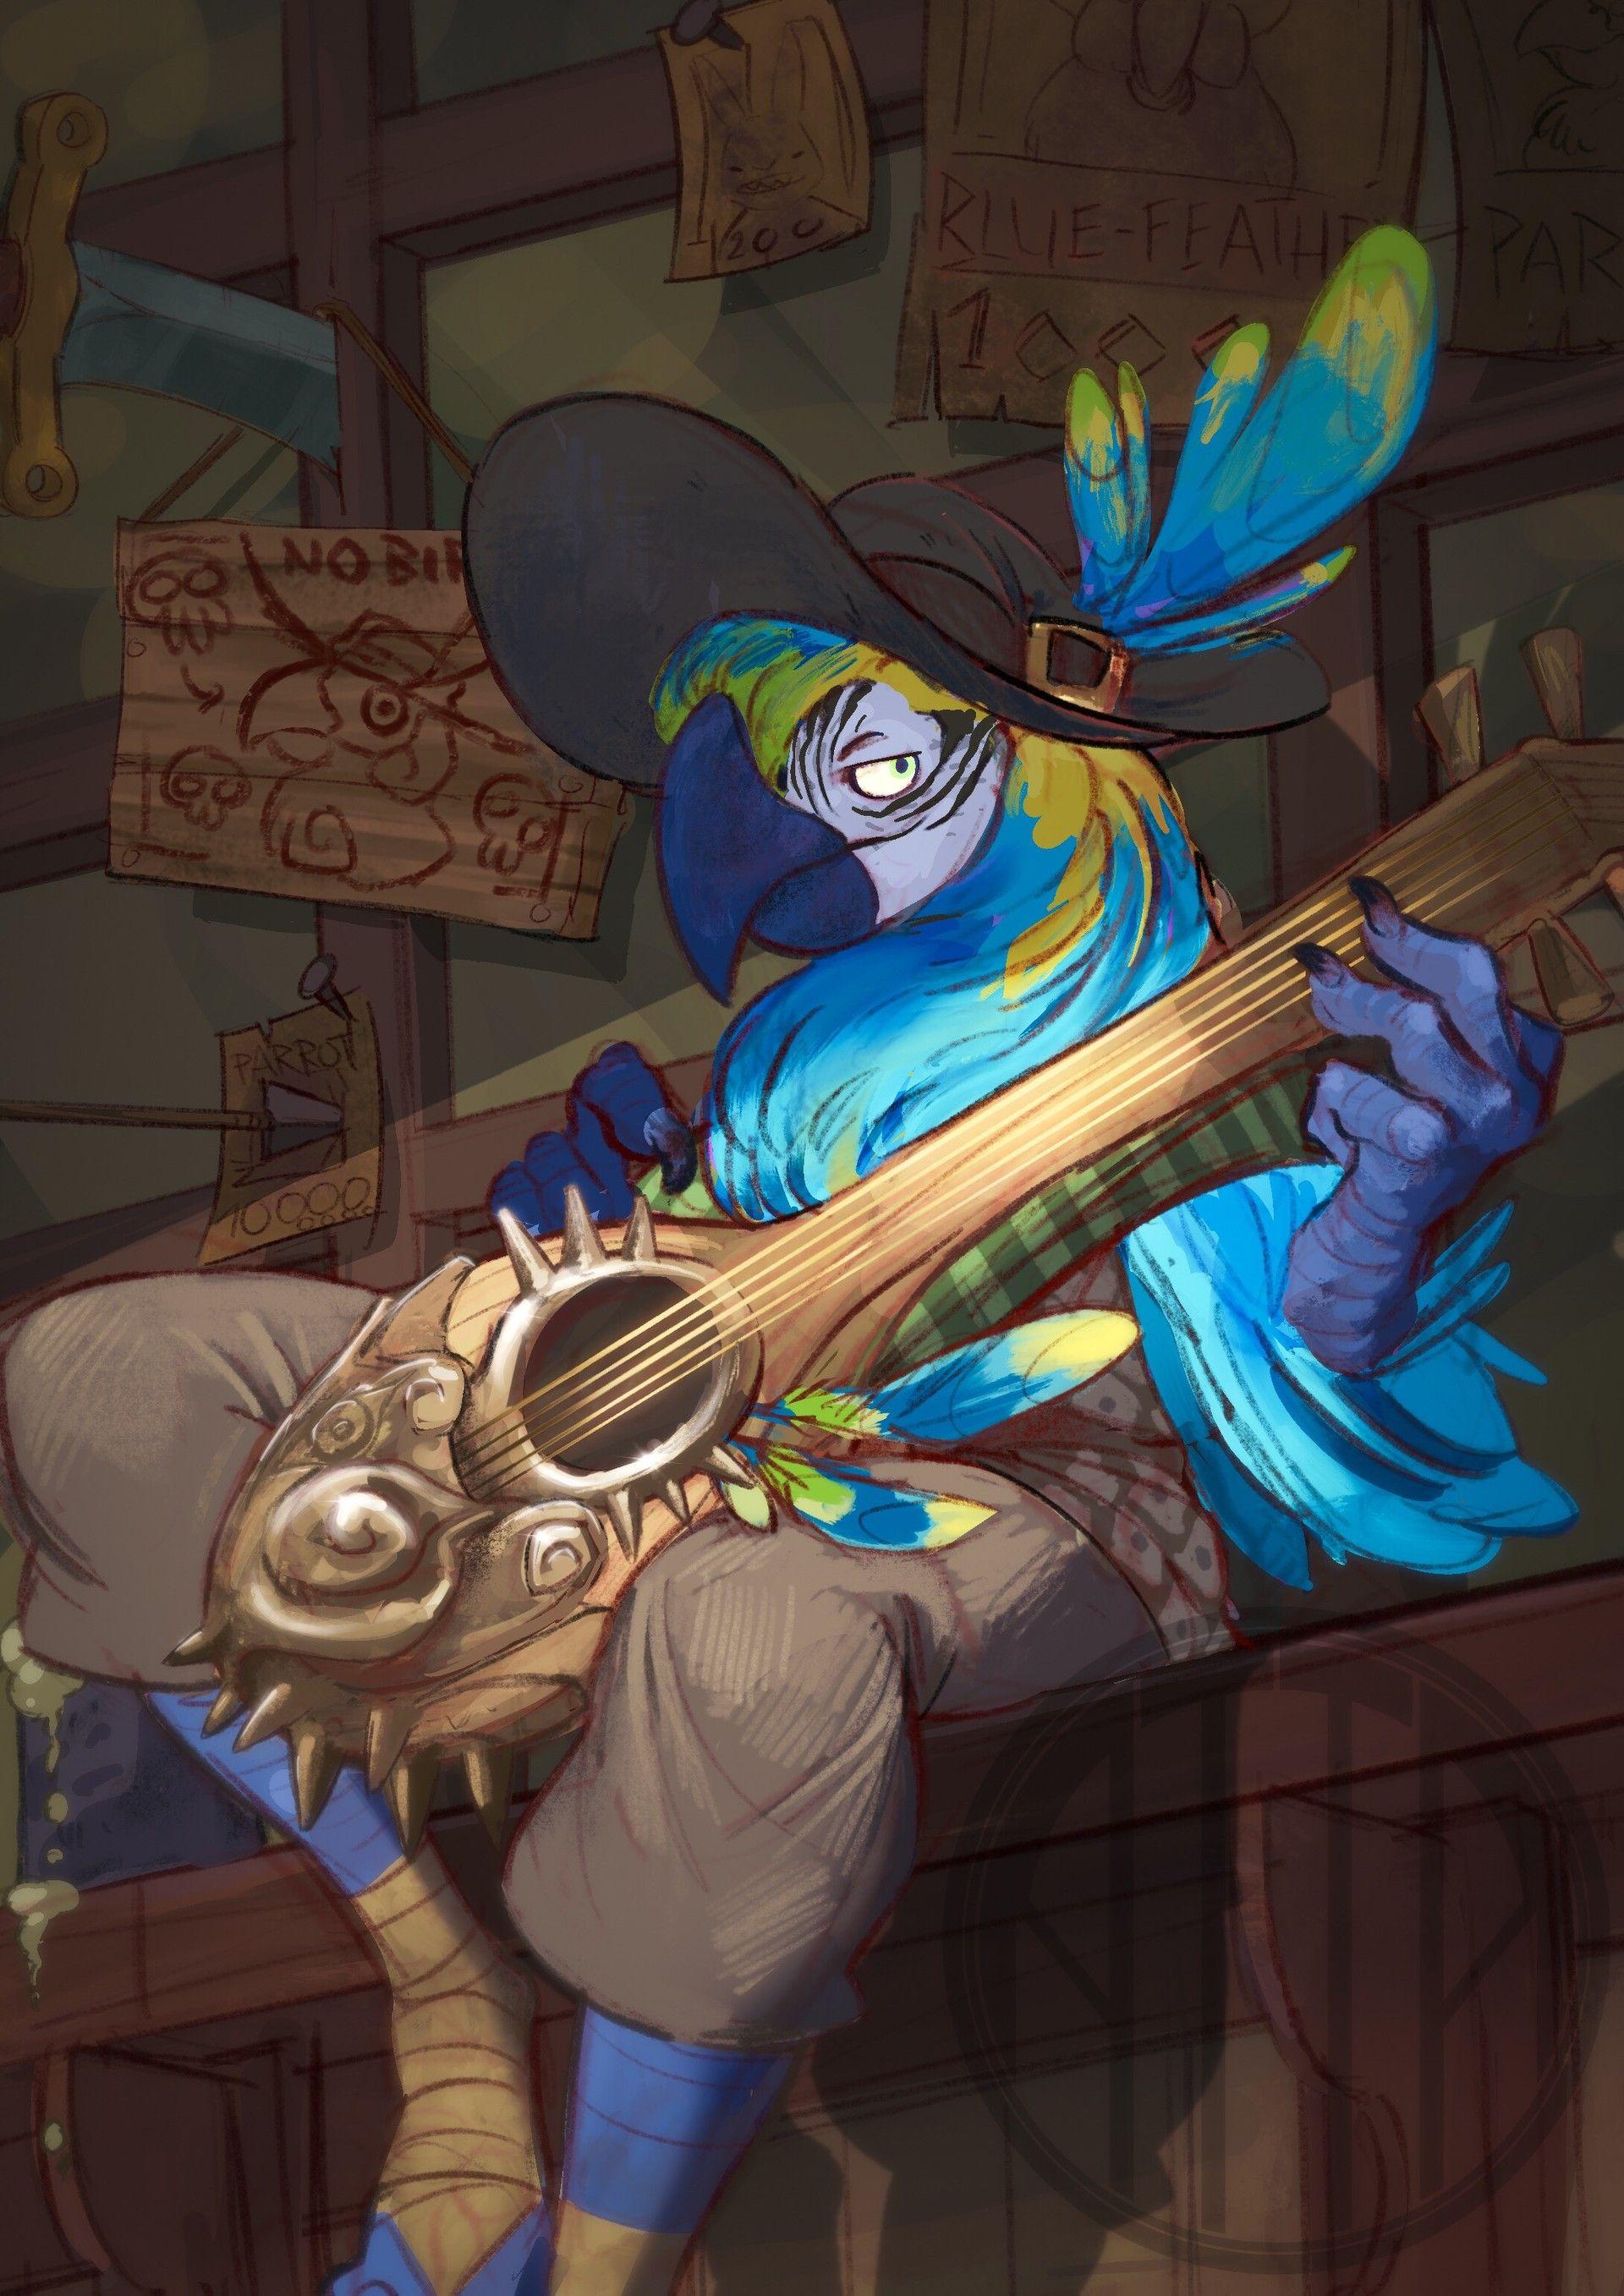 ArtStation - Blue-feather, Antoine Gerday